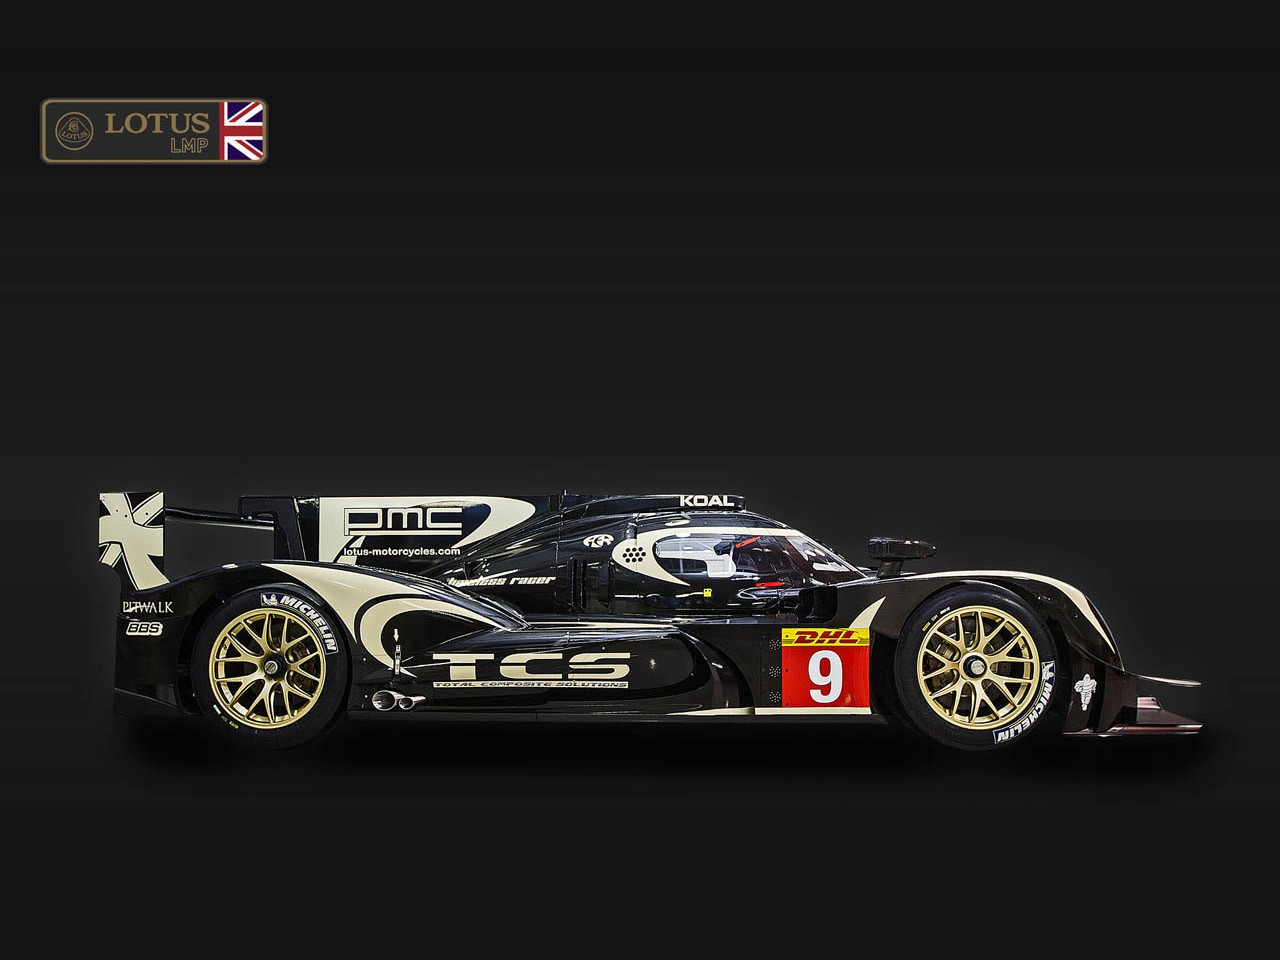 2014 Lotus LMP1 Race Car